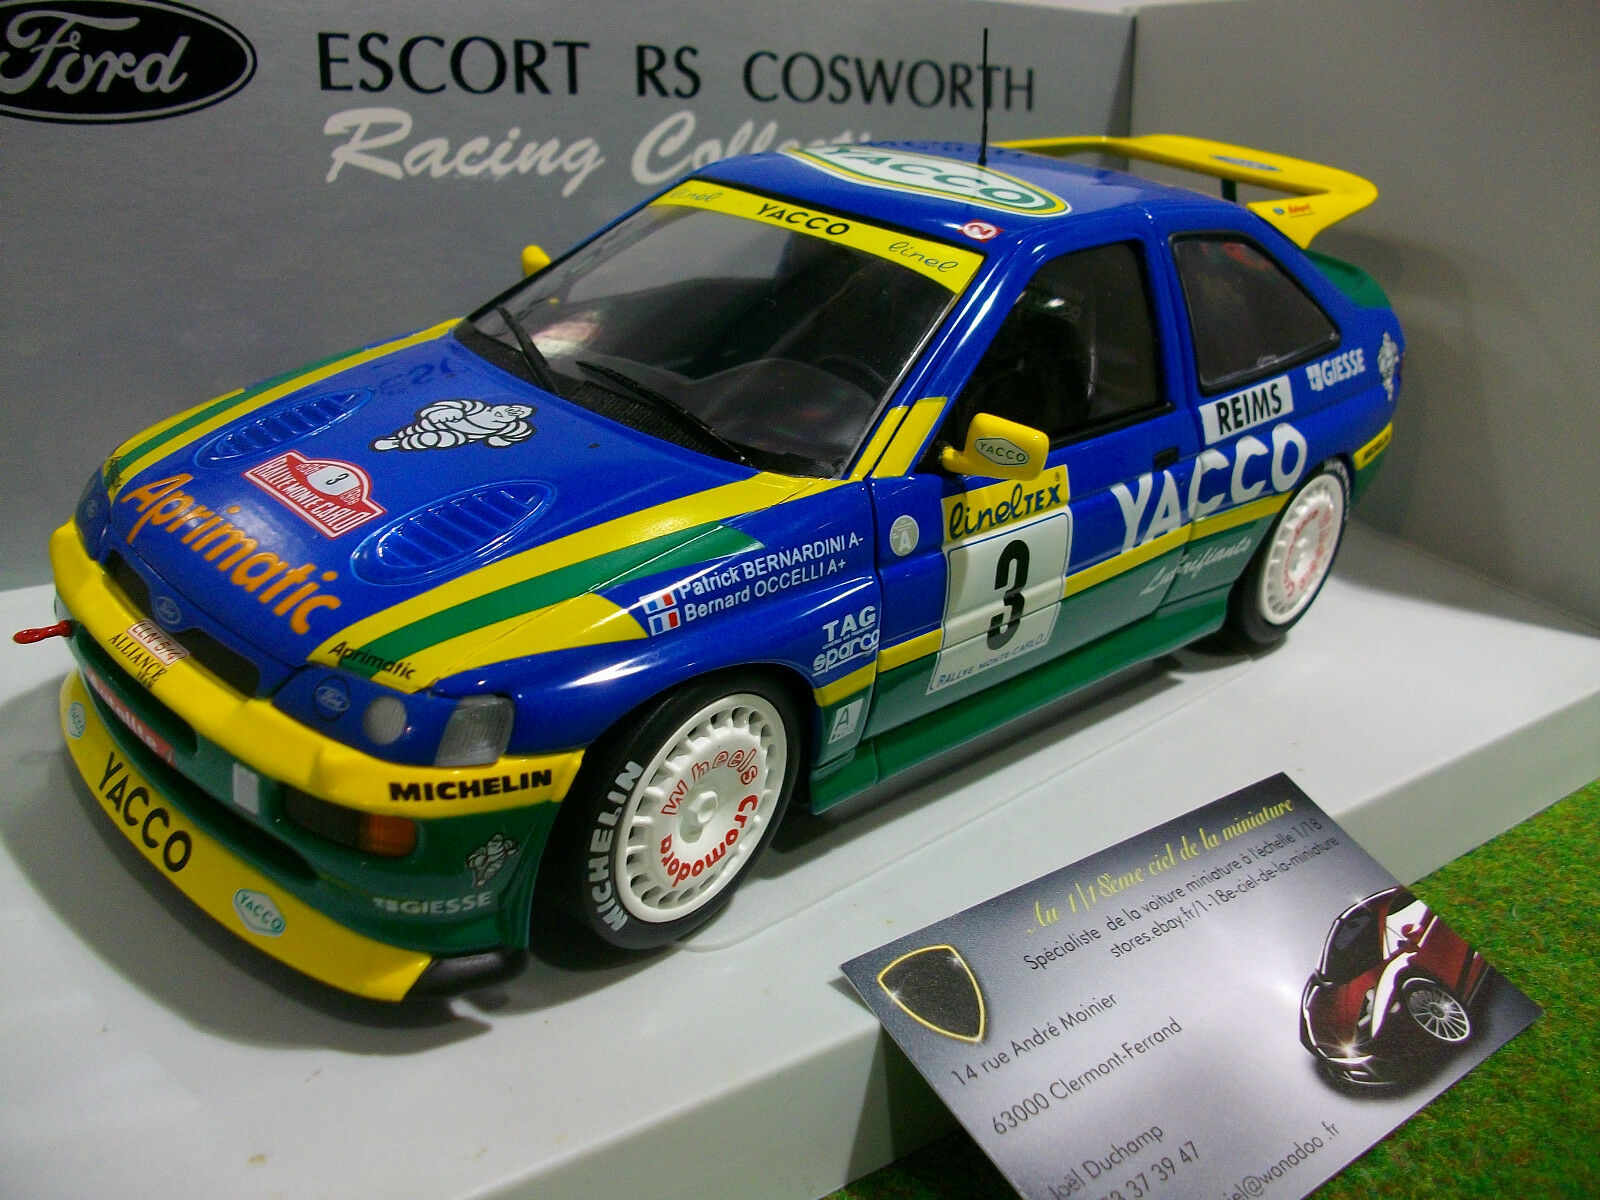 vendita scontata FORD ESCORT RS COSWORTH YACCO MONTE autoLO 1996 1st 1st 1st au 1 18 d UT modellos 180968203  vendite online